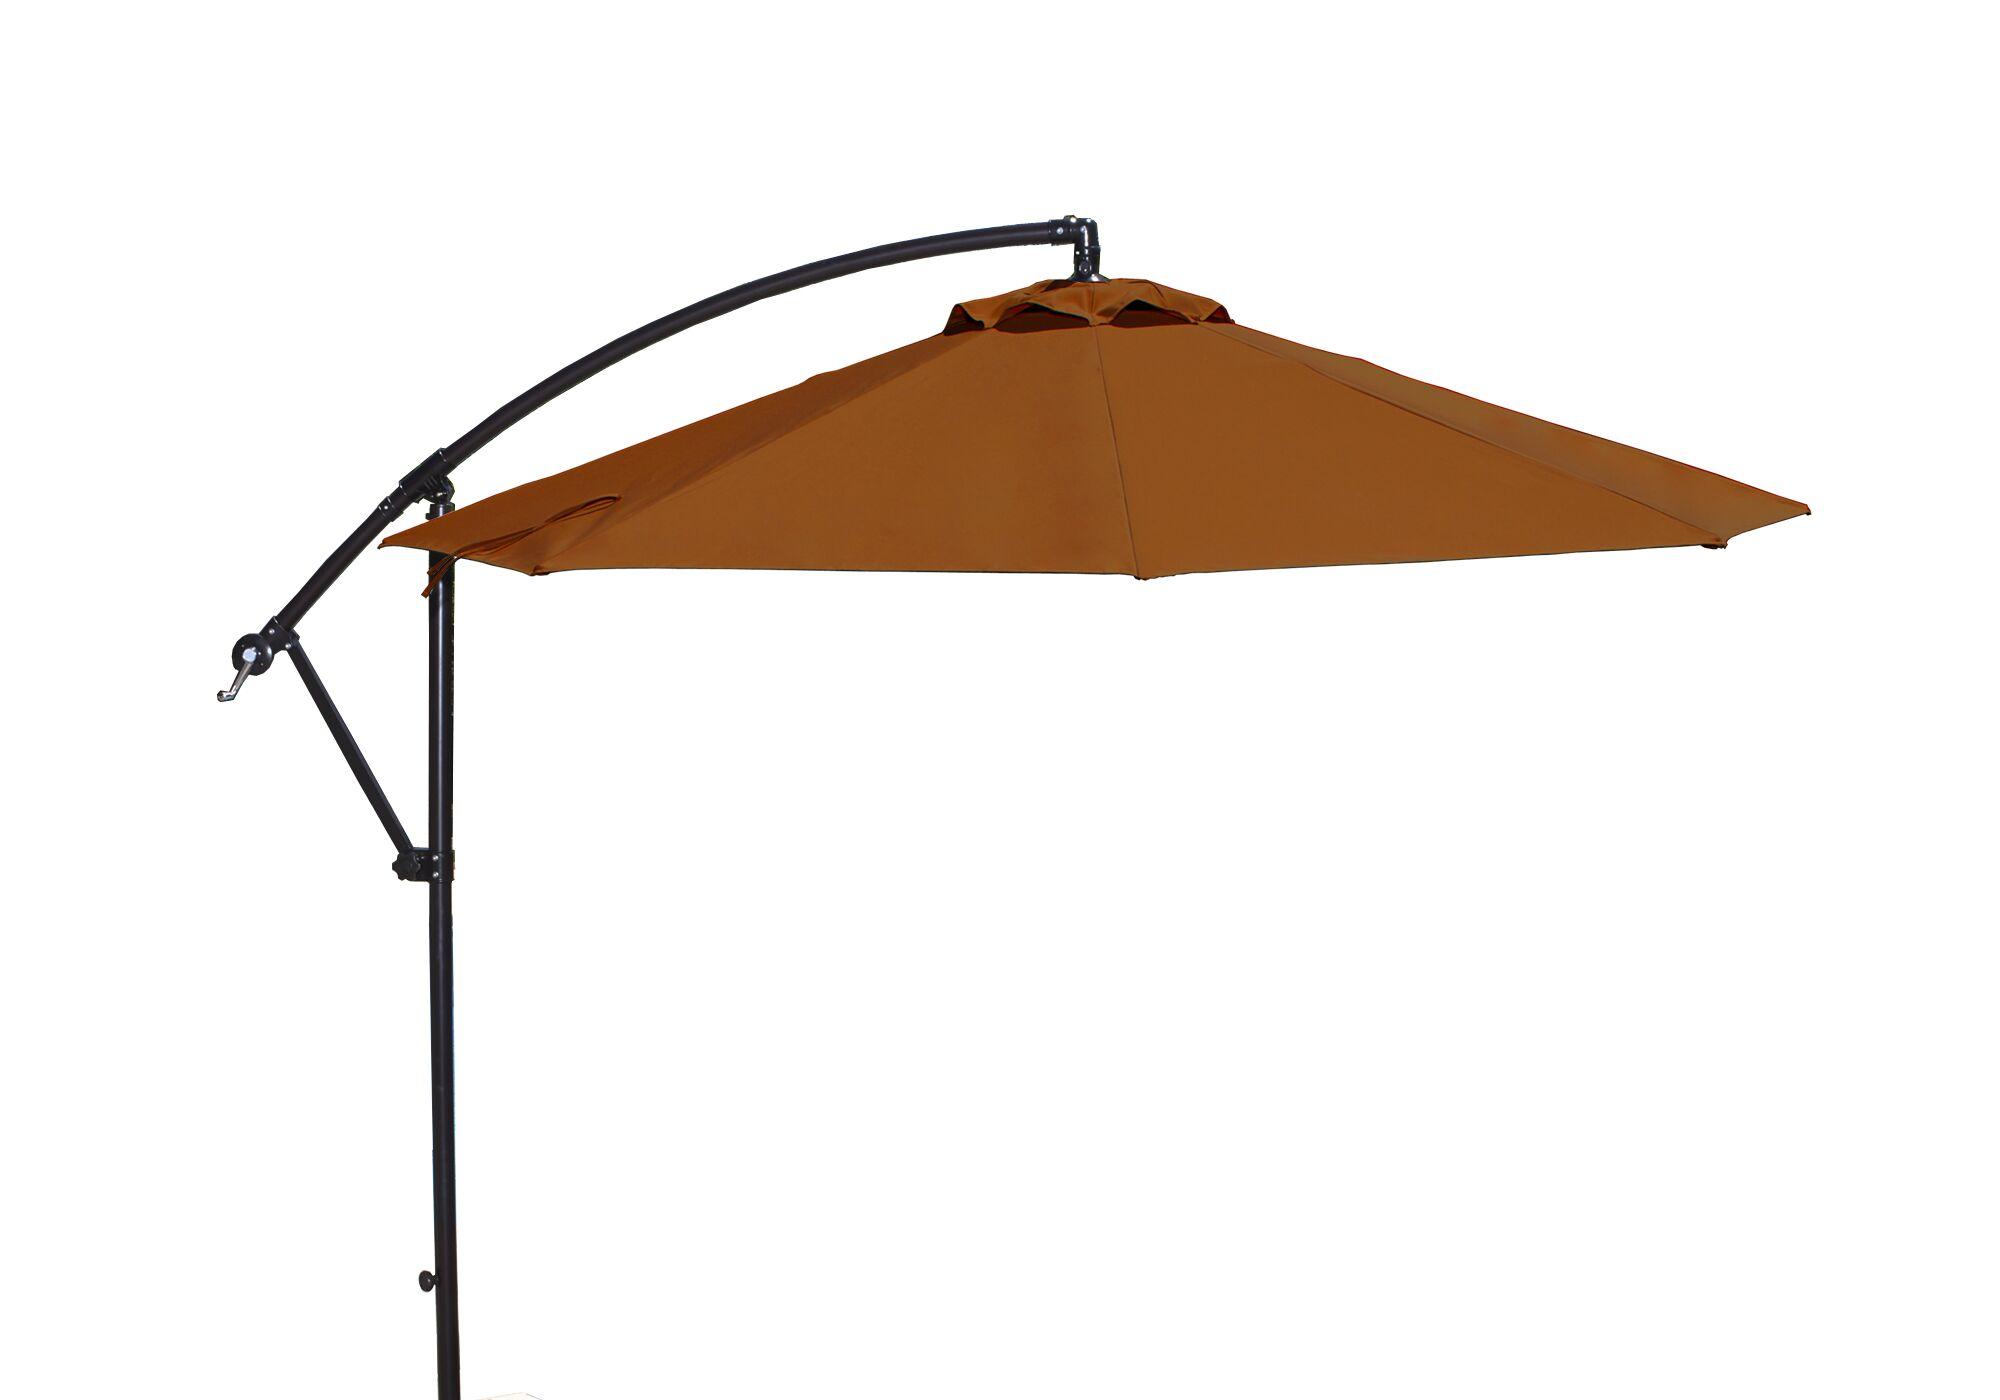 Santiago 10' Cantilever Sunbrella Umbrella Fabric: Terra Cotta Sunbrella Acrylic